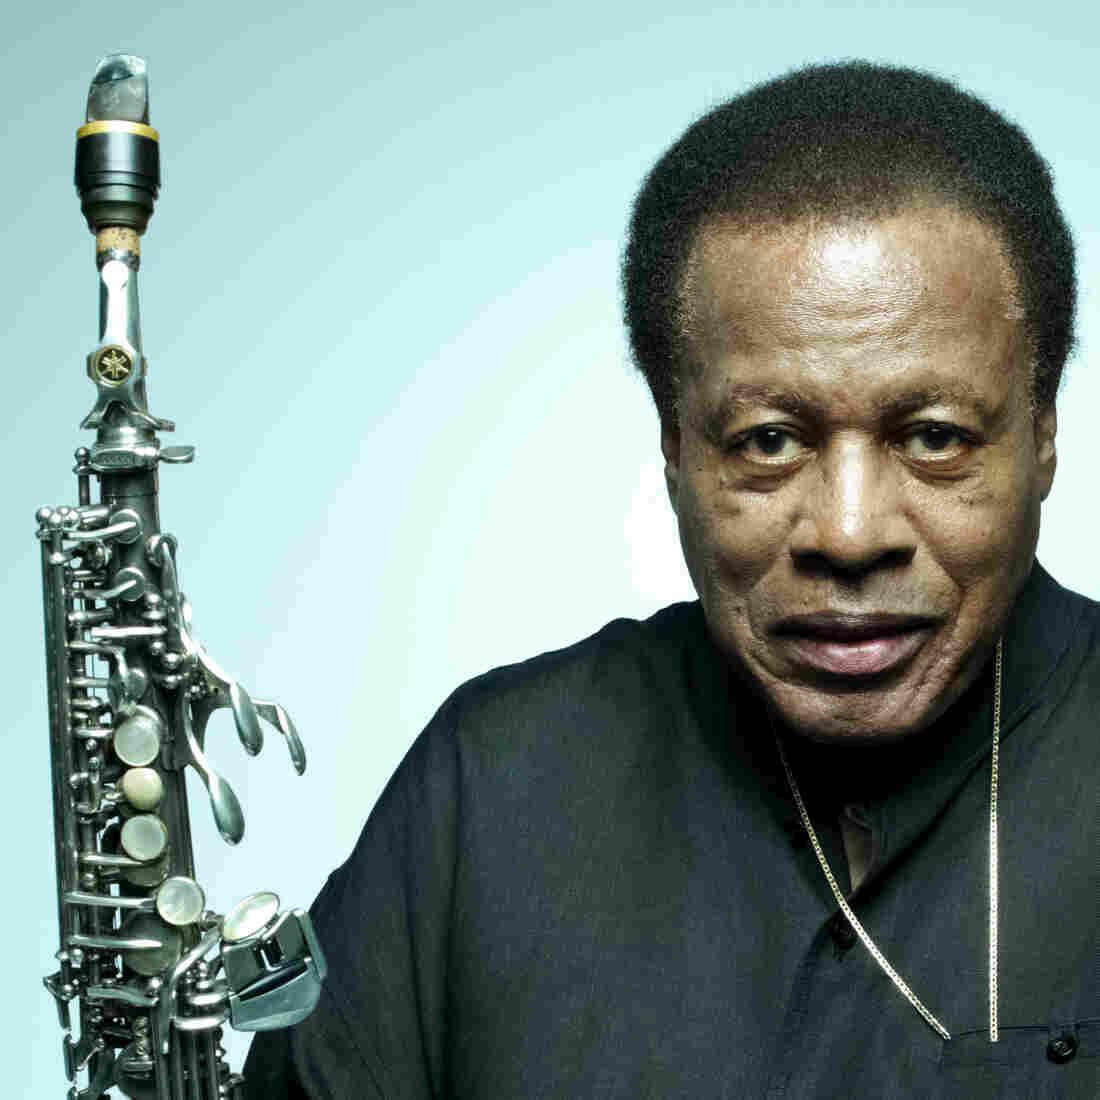 The 2013 NPR Music Jazz Critics Poll